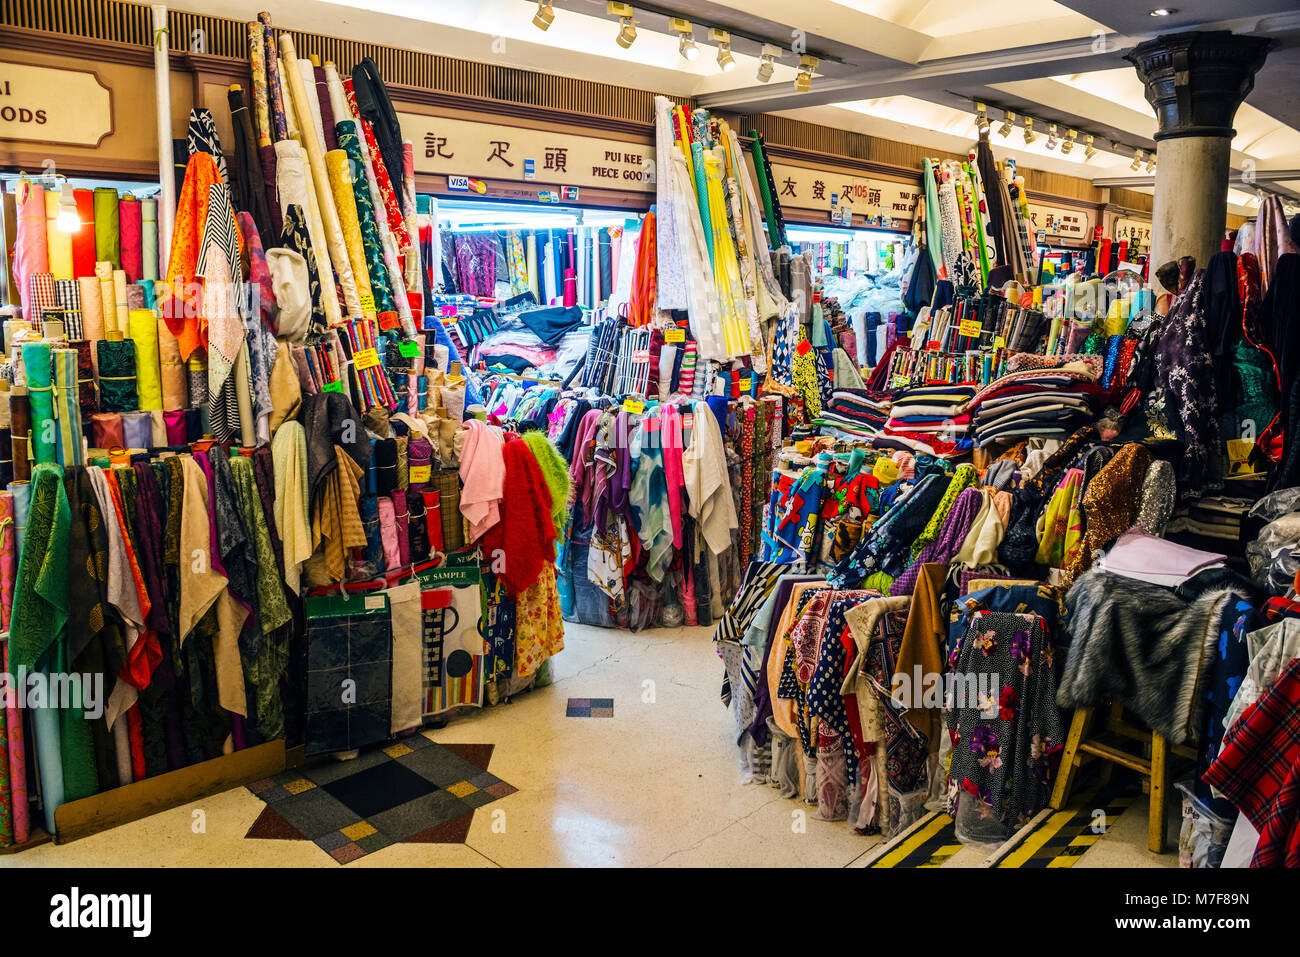 Fabric Shop, Western Market, Central, Hong Kong Stock Photo